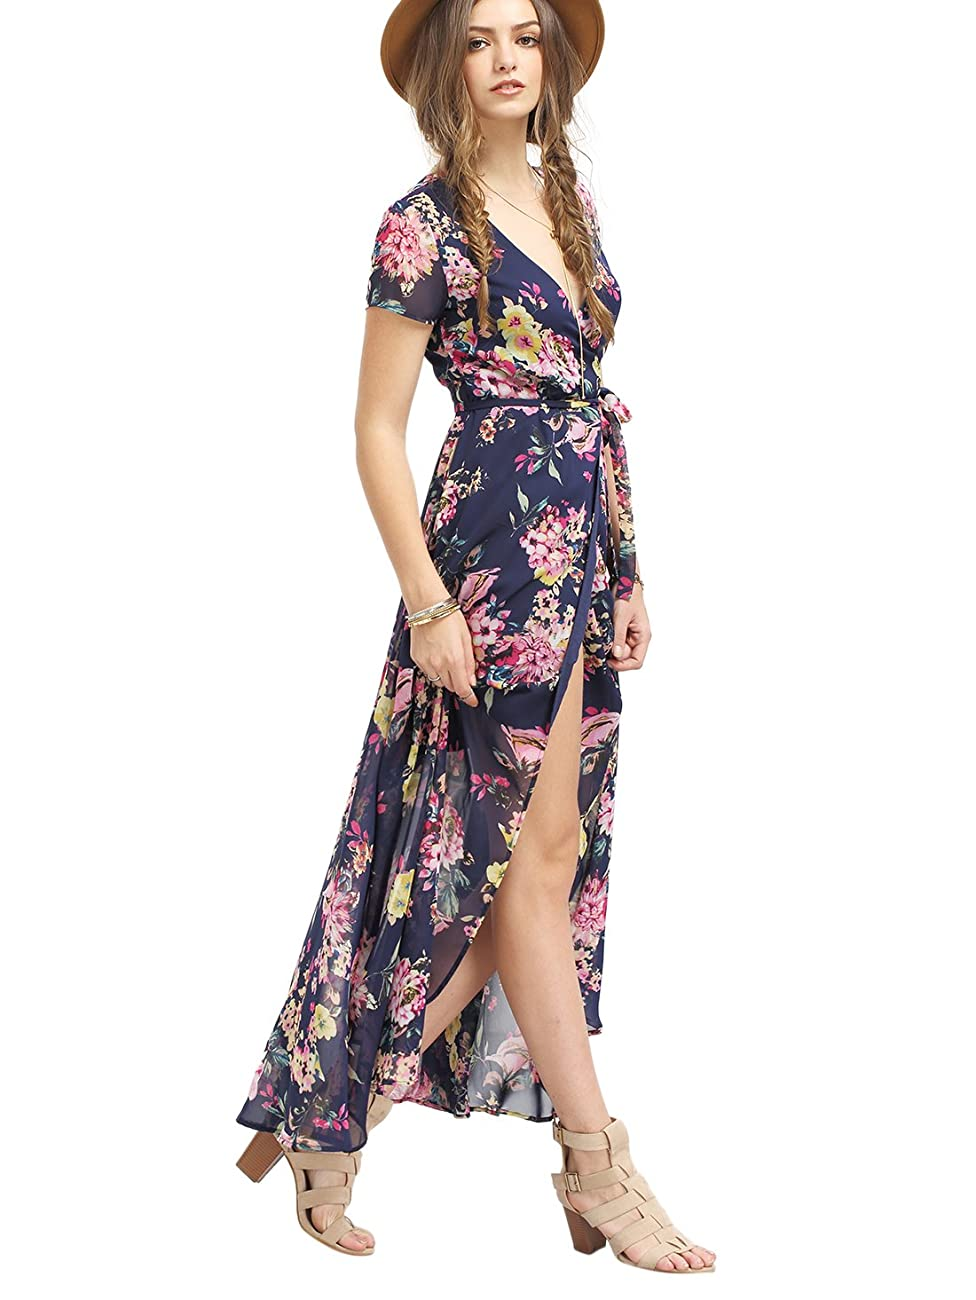 Milumia Women's Vintage Floral Print Split Wrap Maxi Dress 1